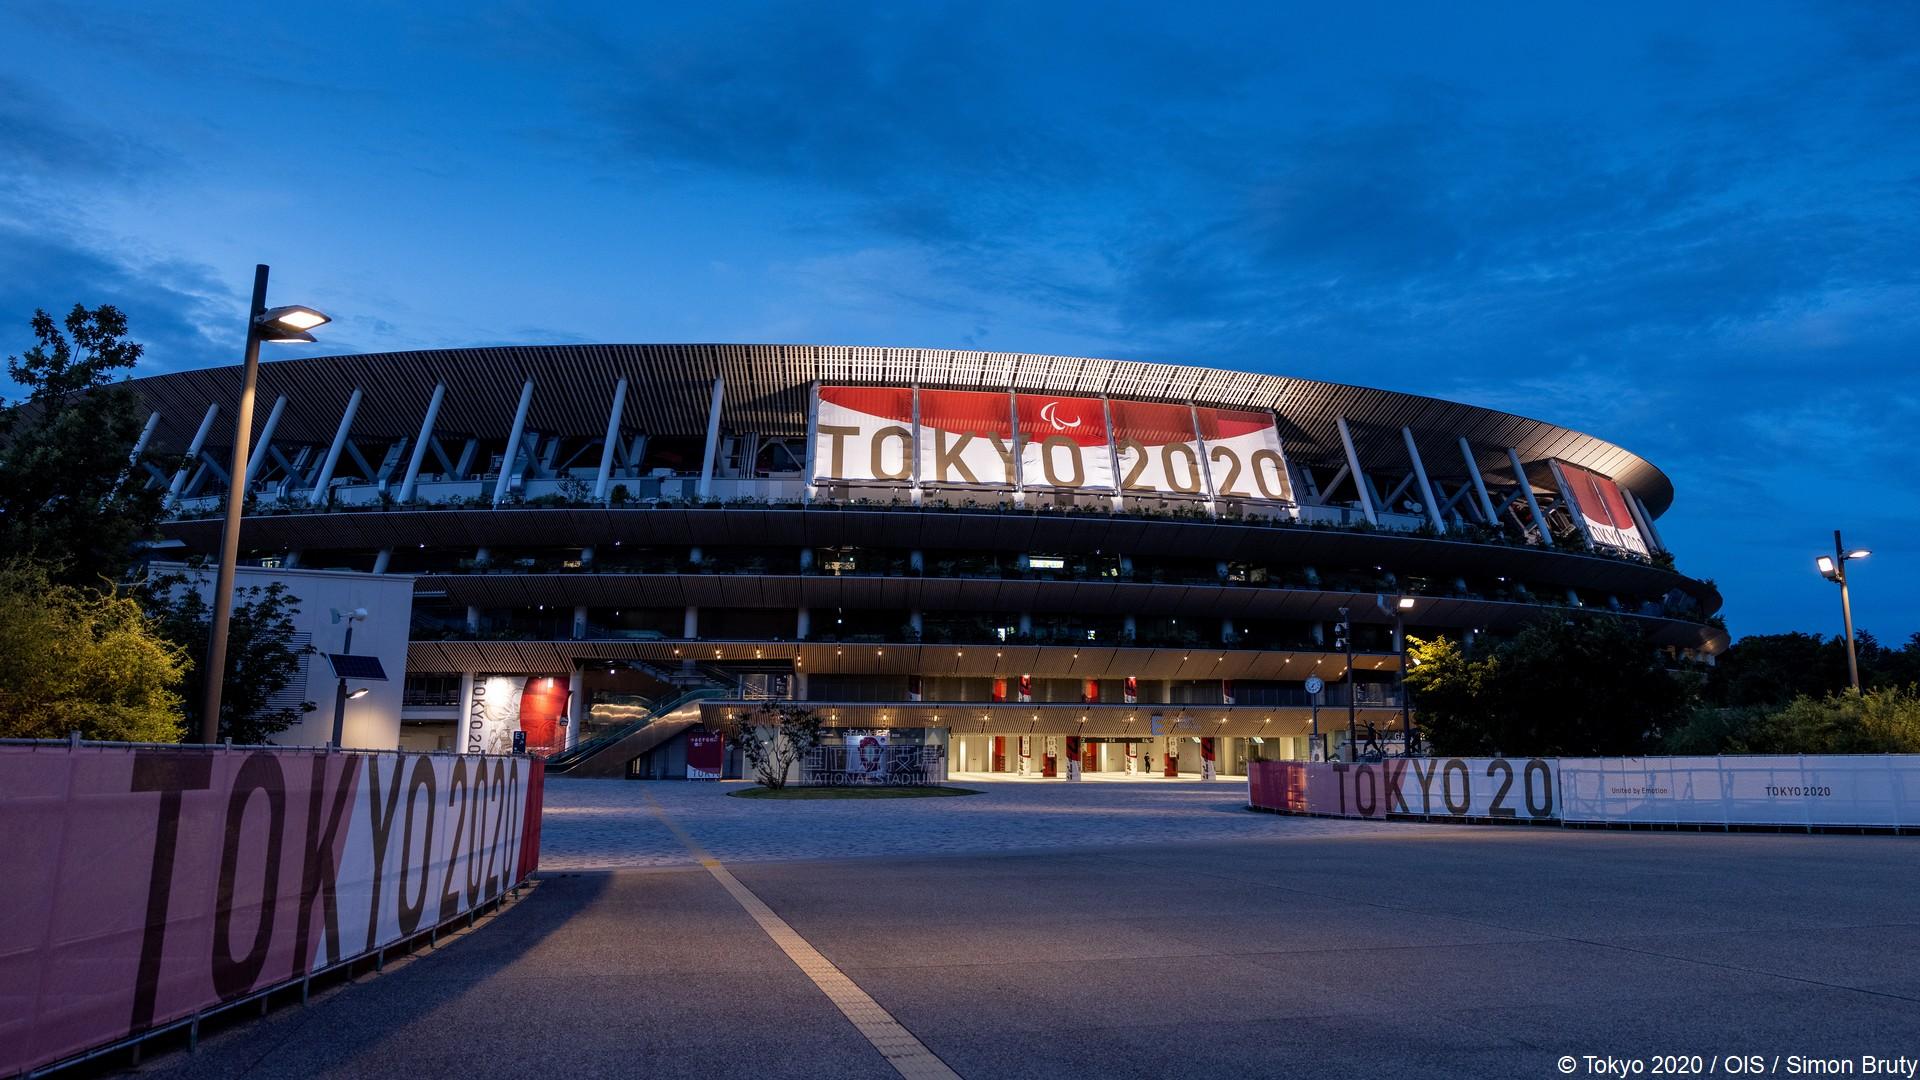 Tokyo 2020 – Paralympiques (3)